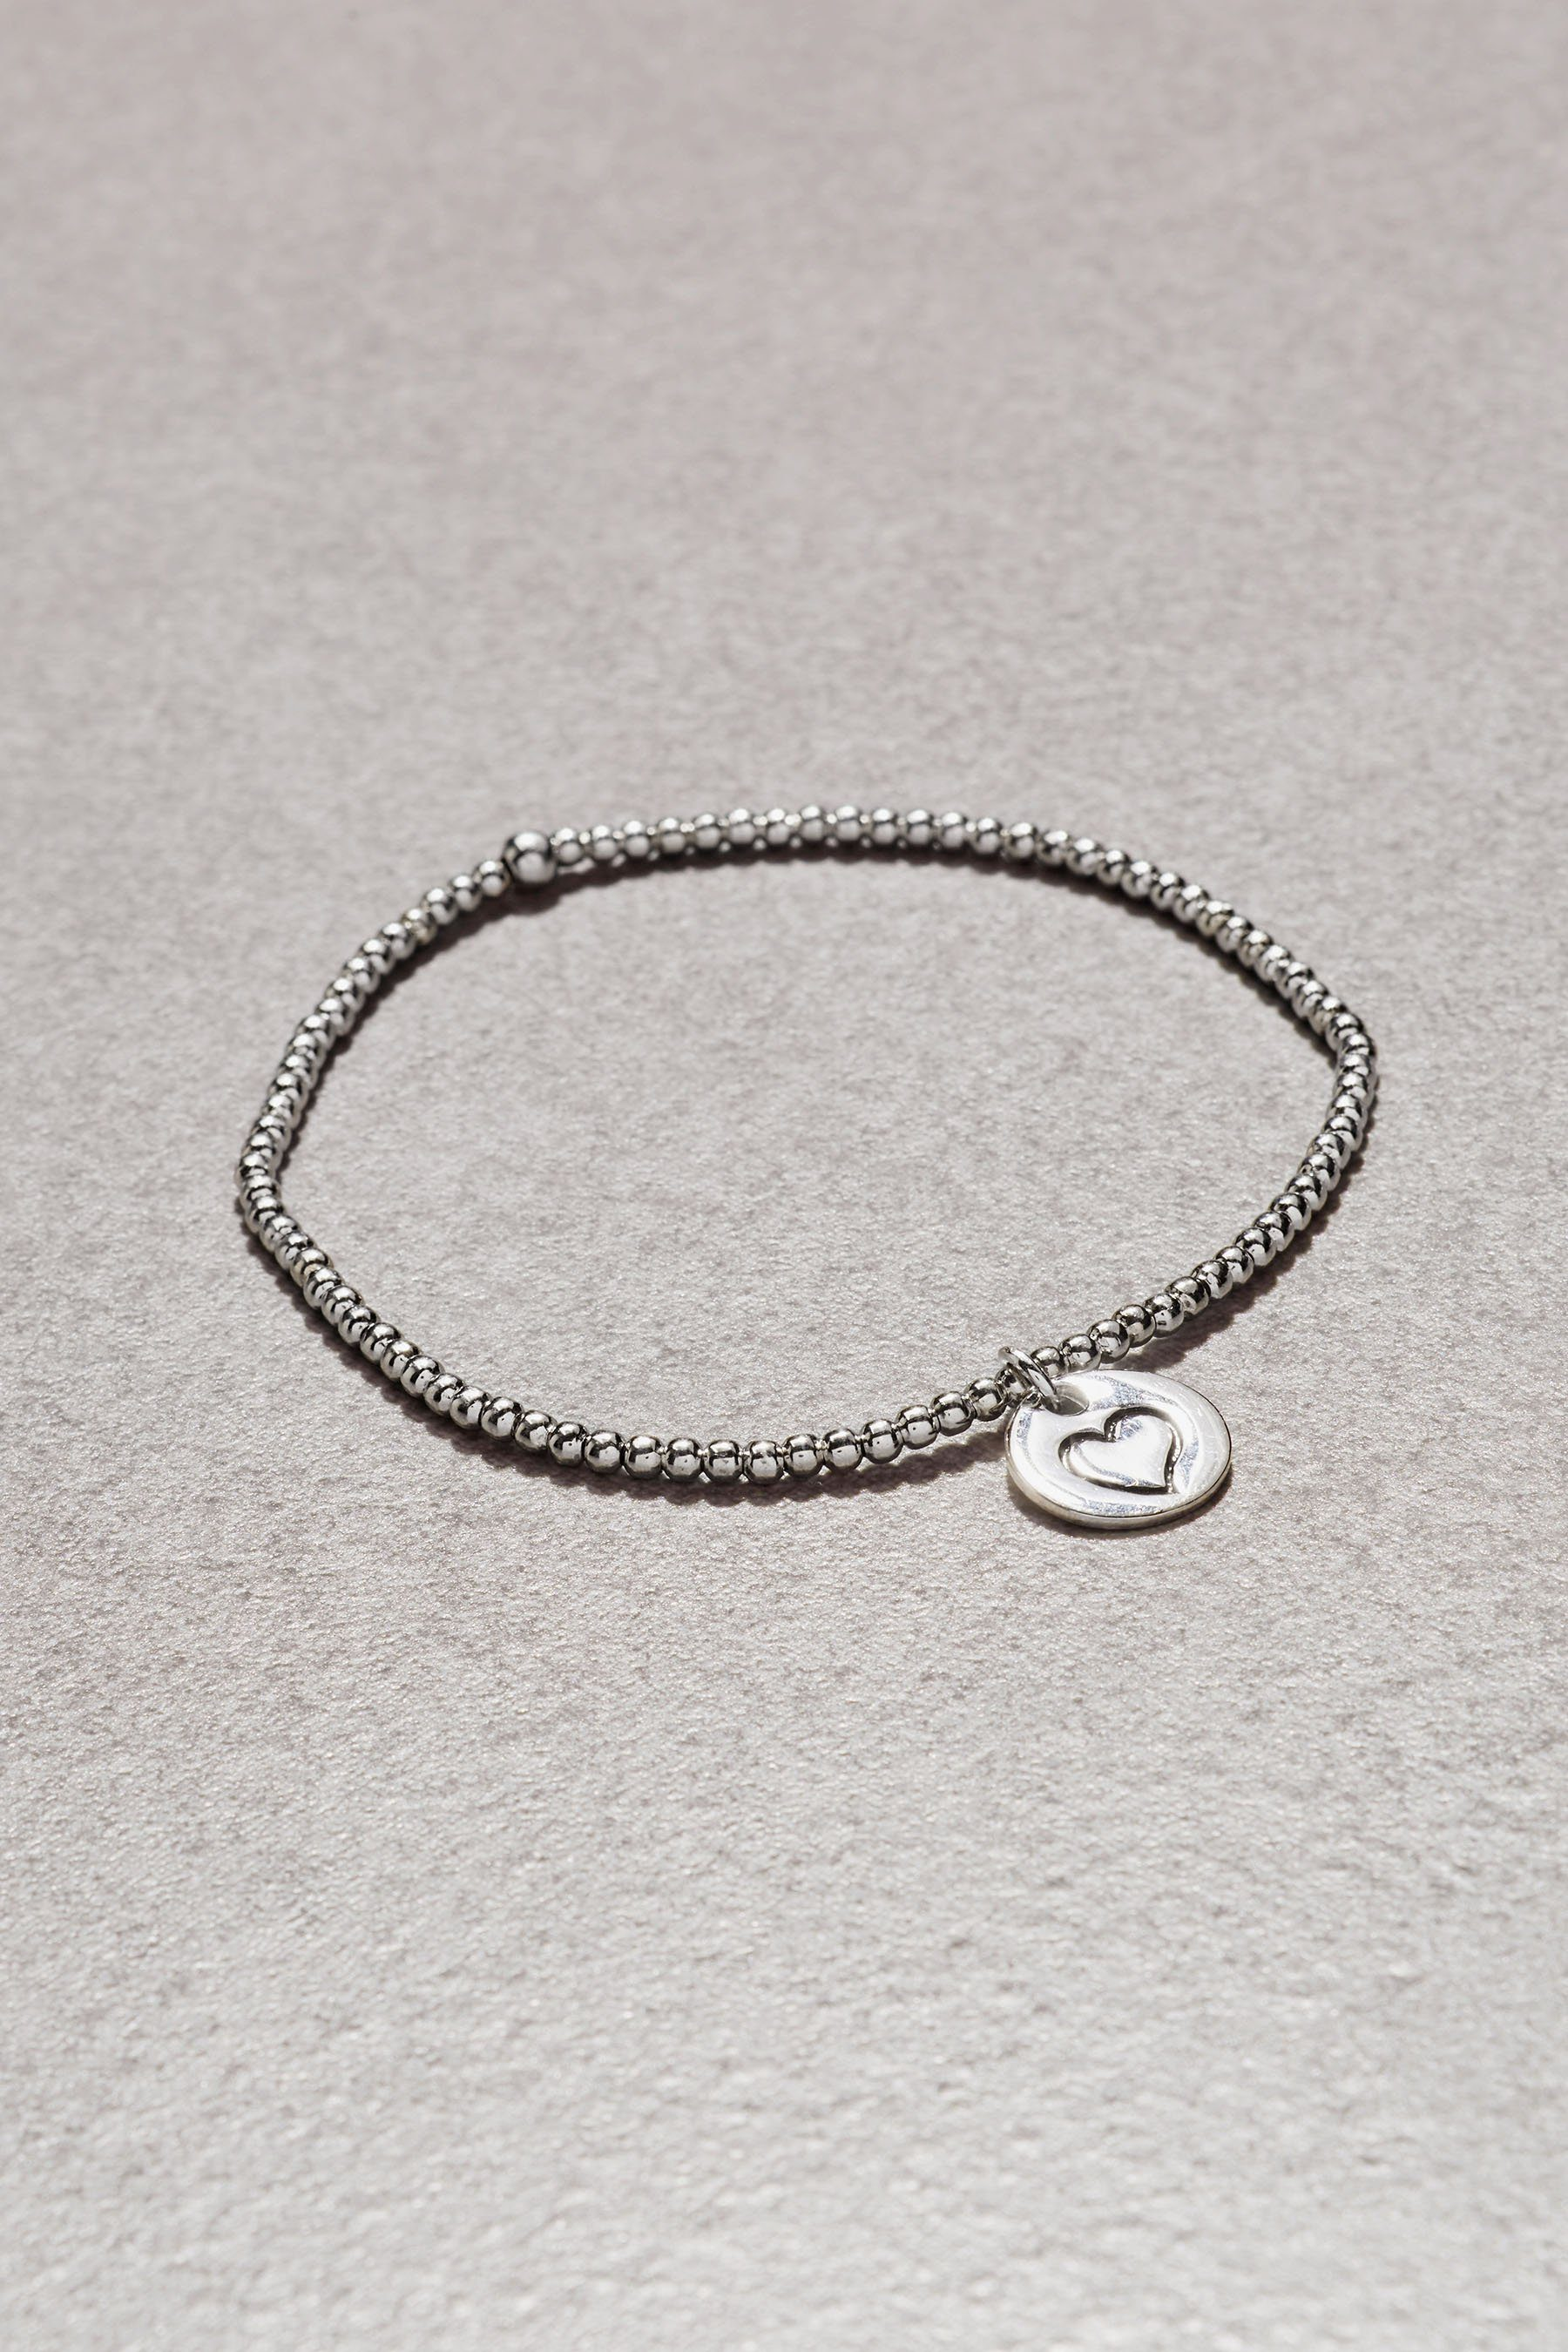 Next Armband in Perlenoptik mit Herz-Charm